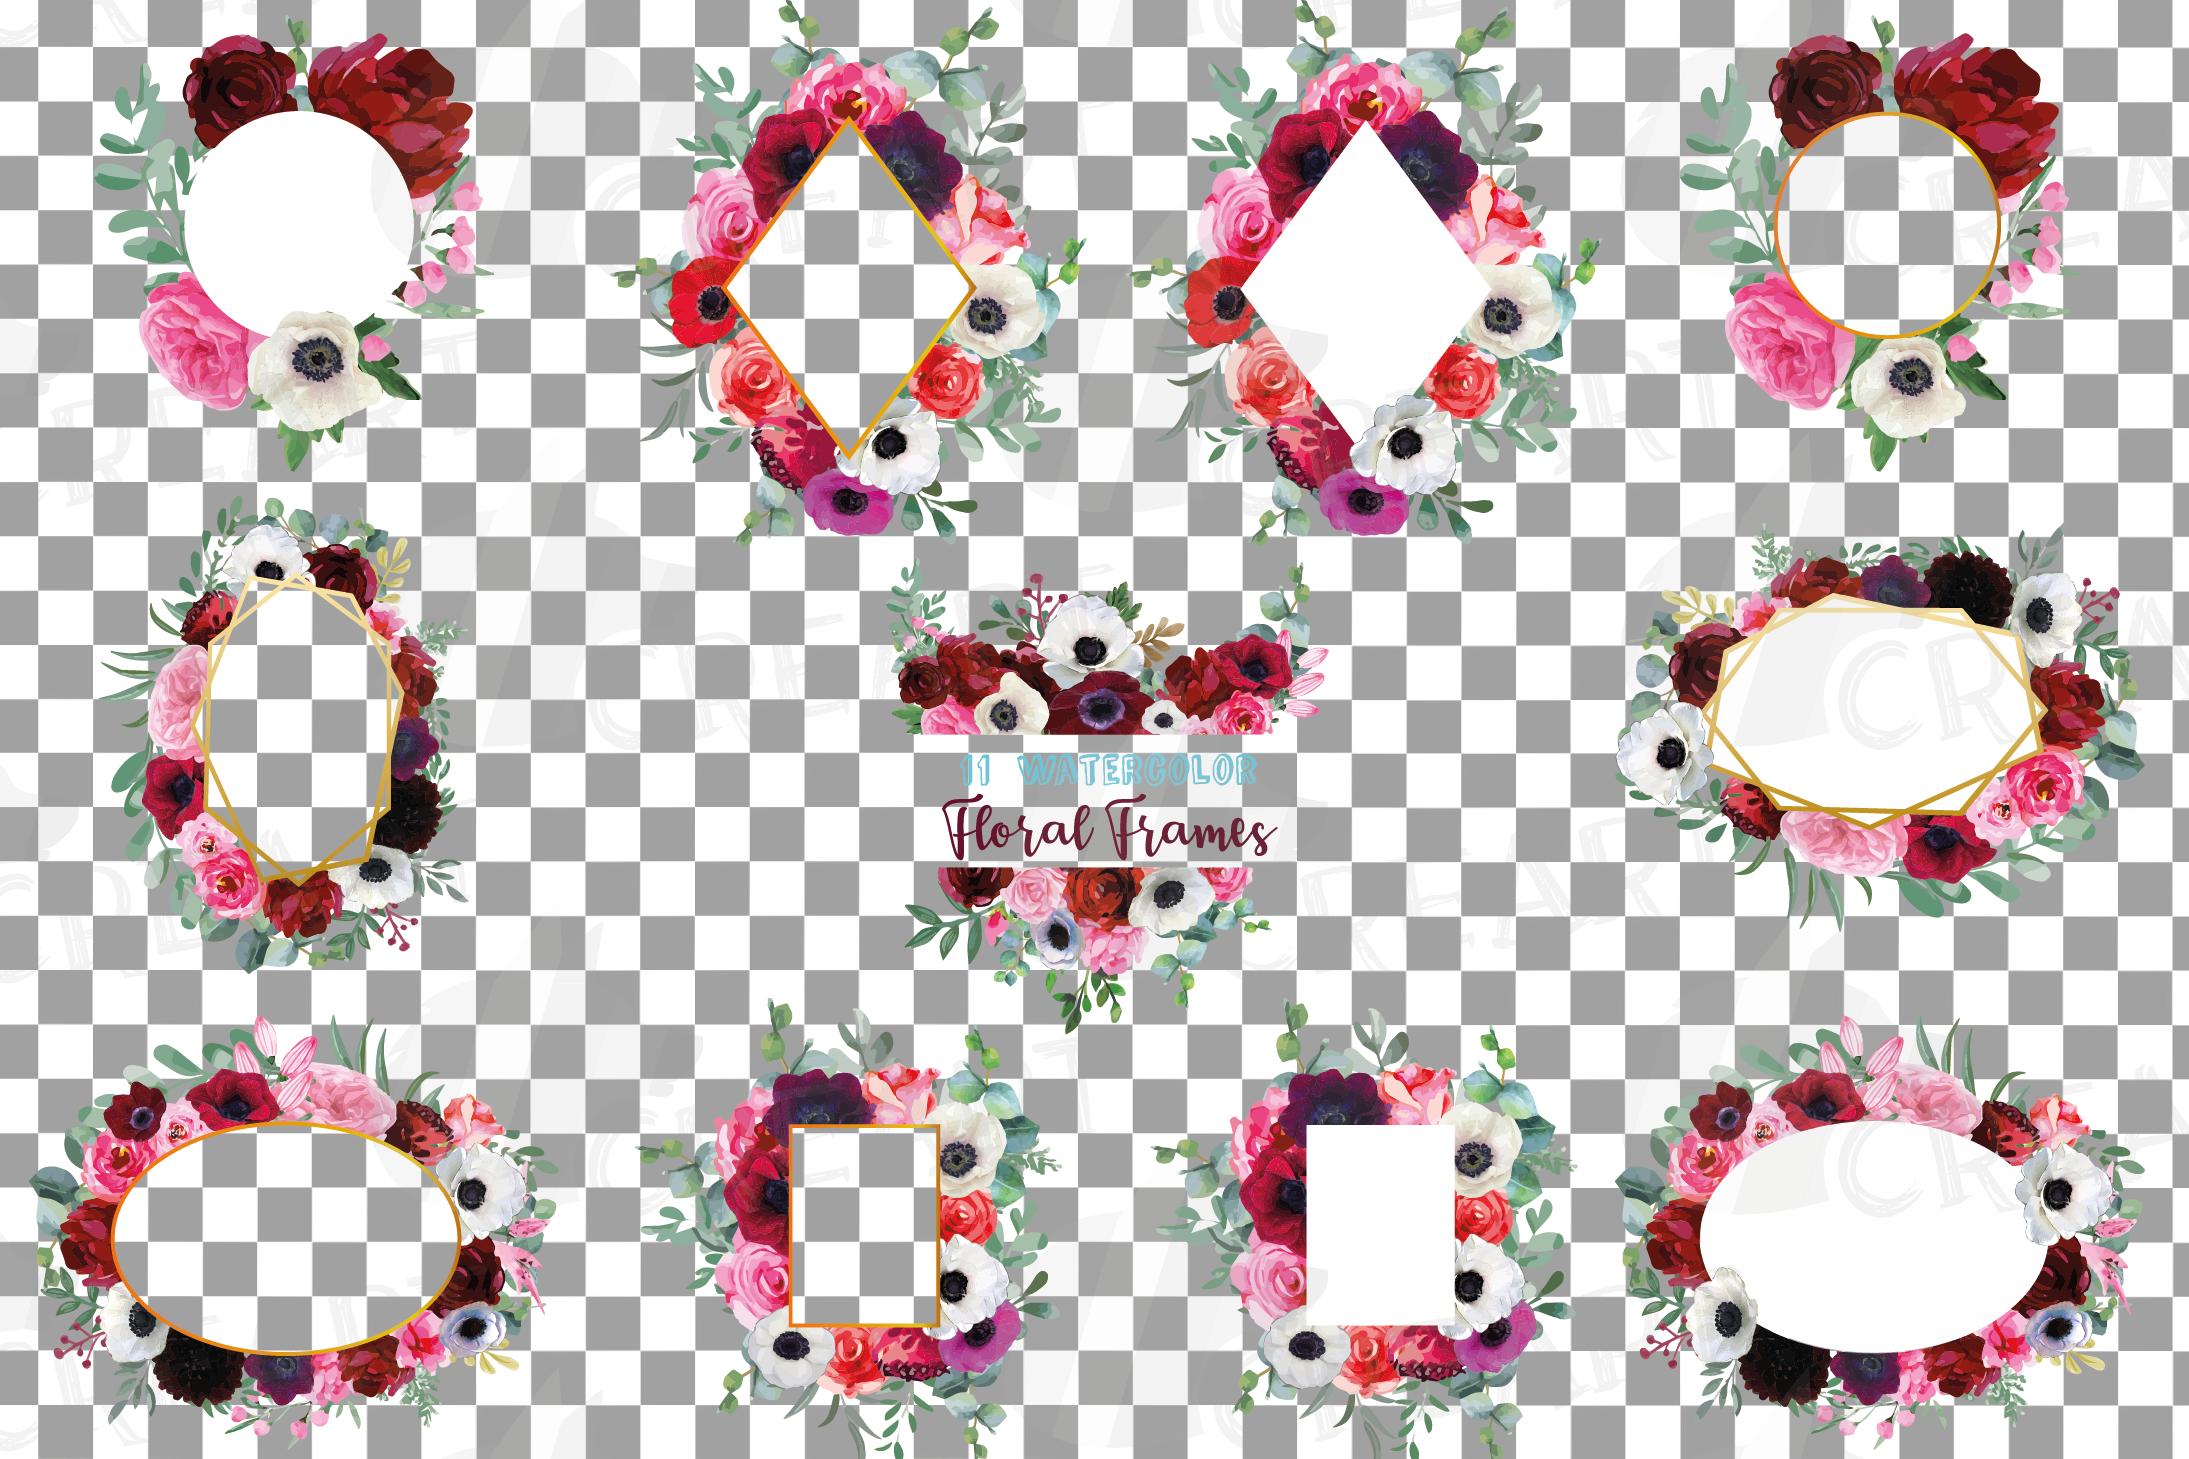 Watercolor elegant floral borders, rose, anemone frames example image 2